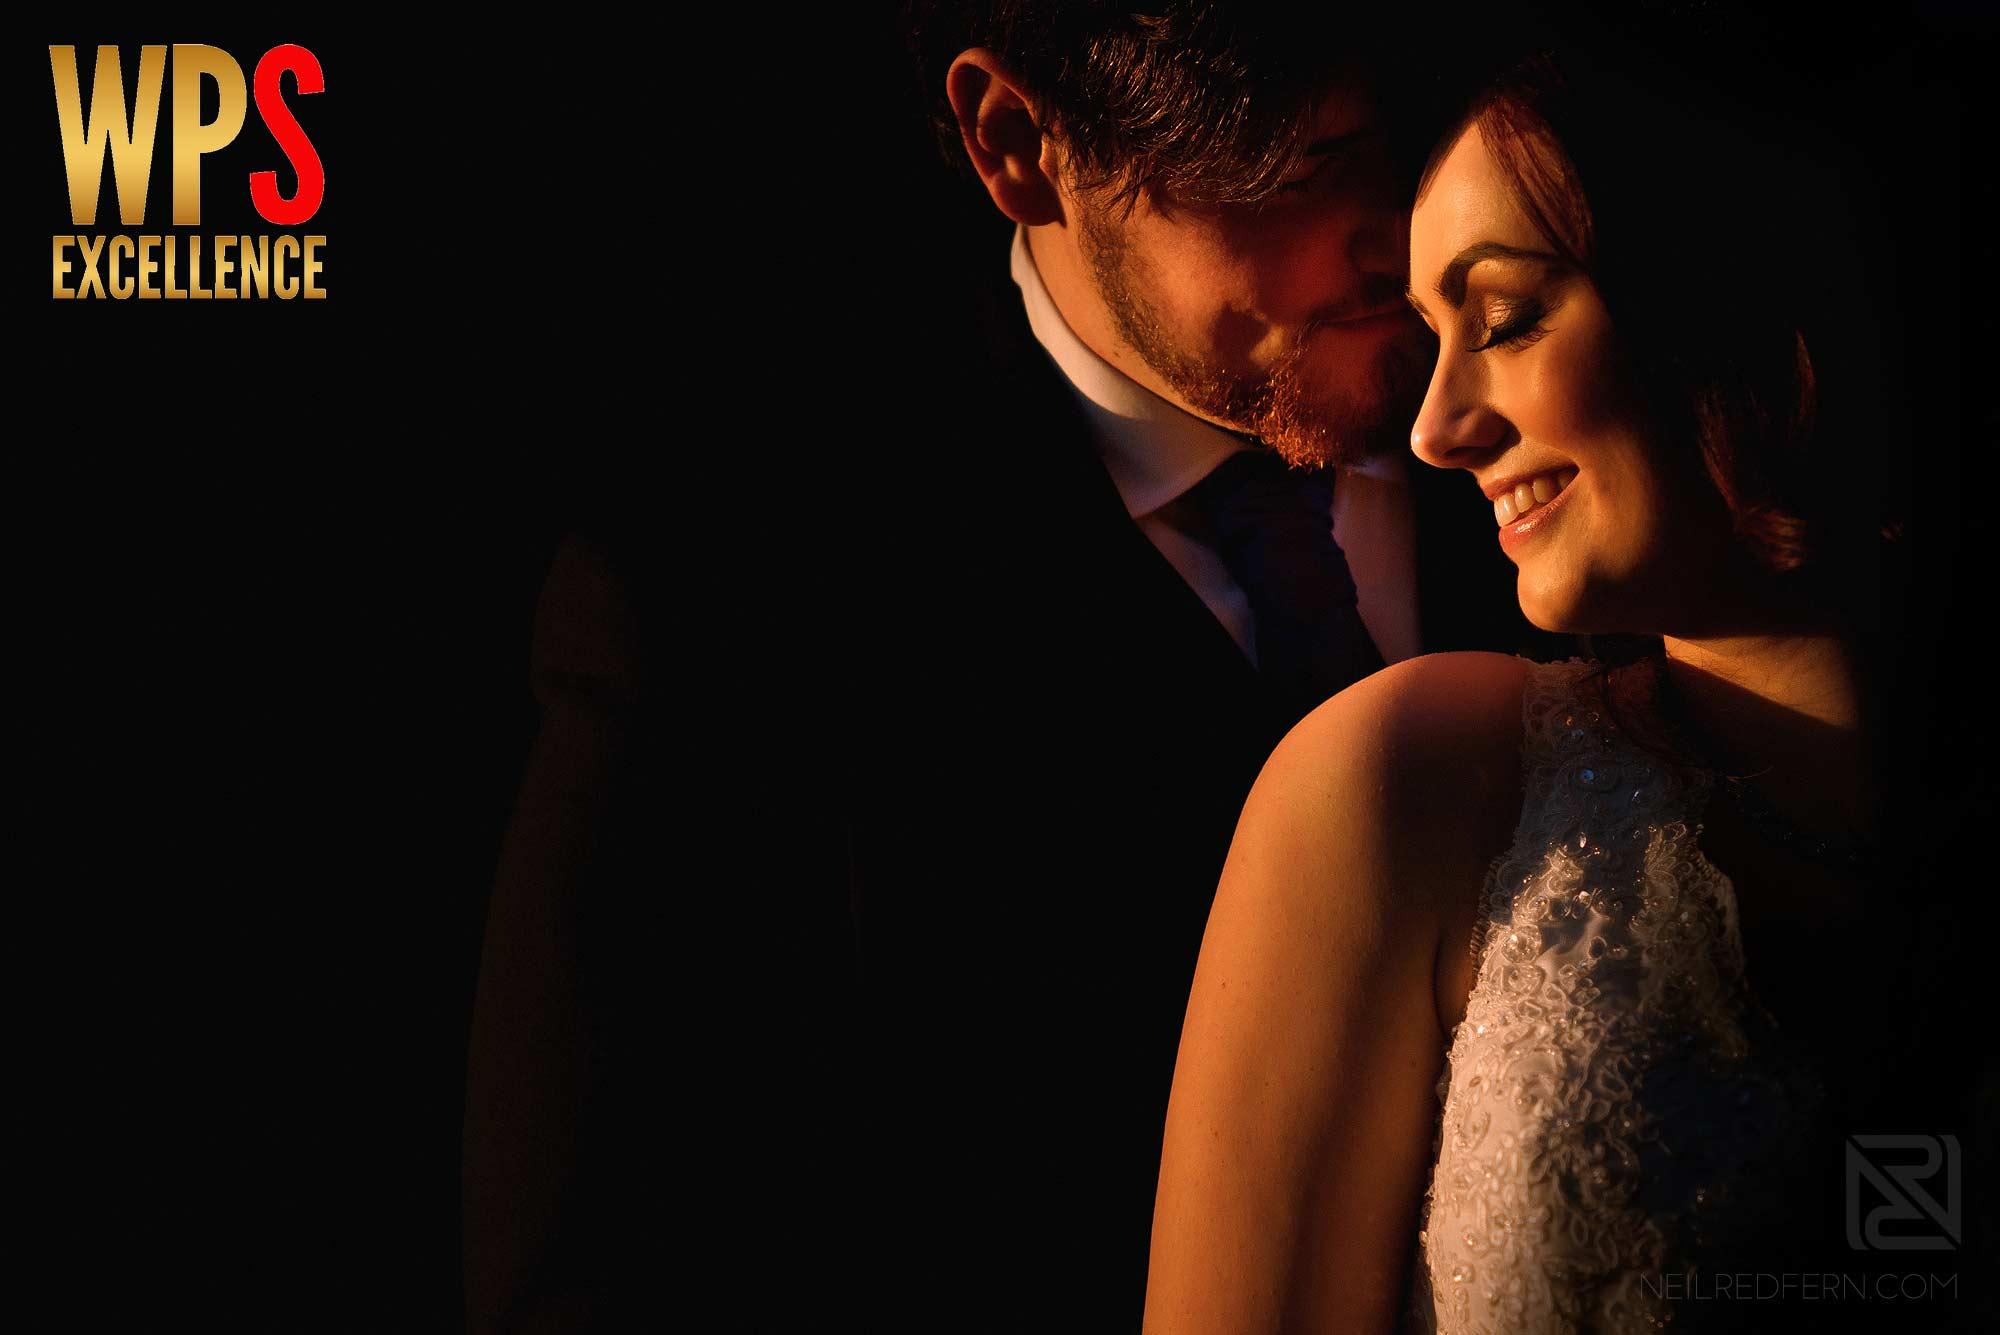 wedding photography select award winning photograph taken at Knowsley Hall